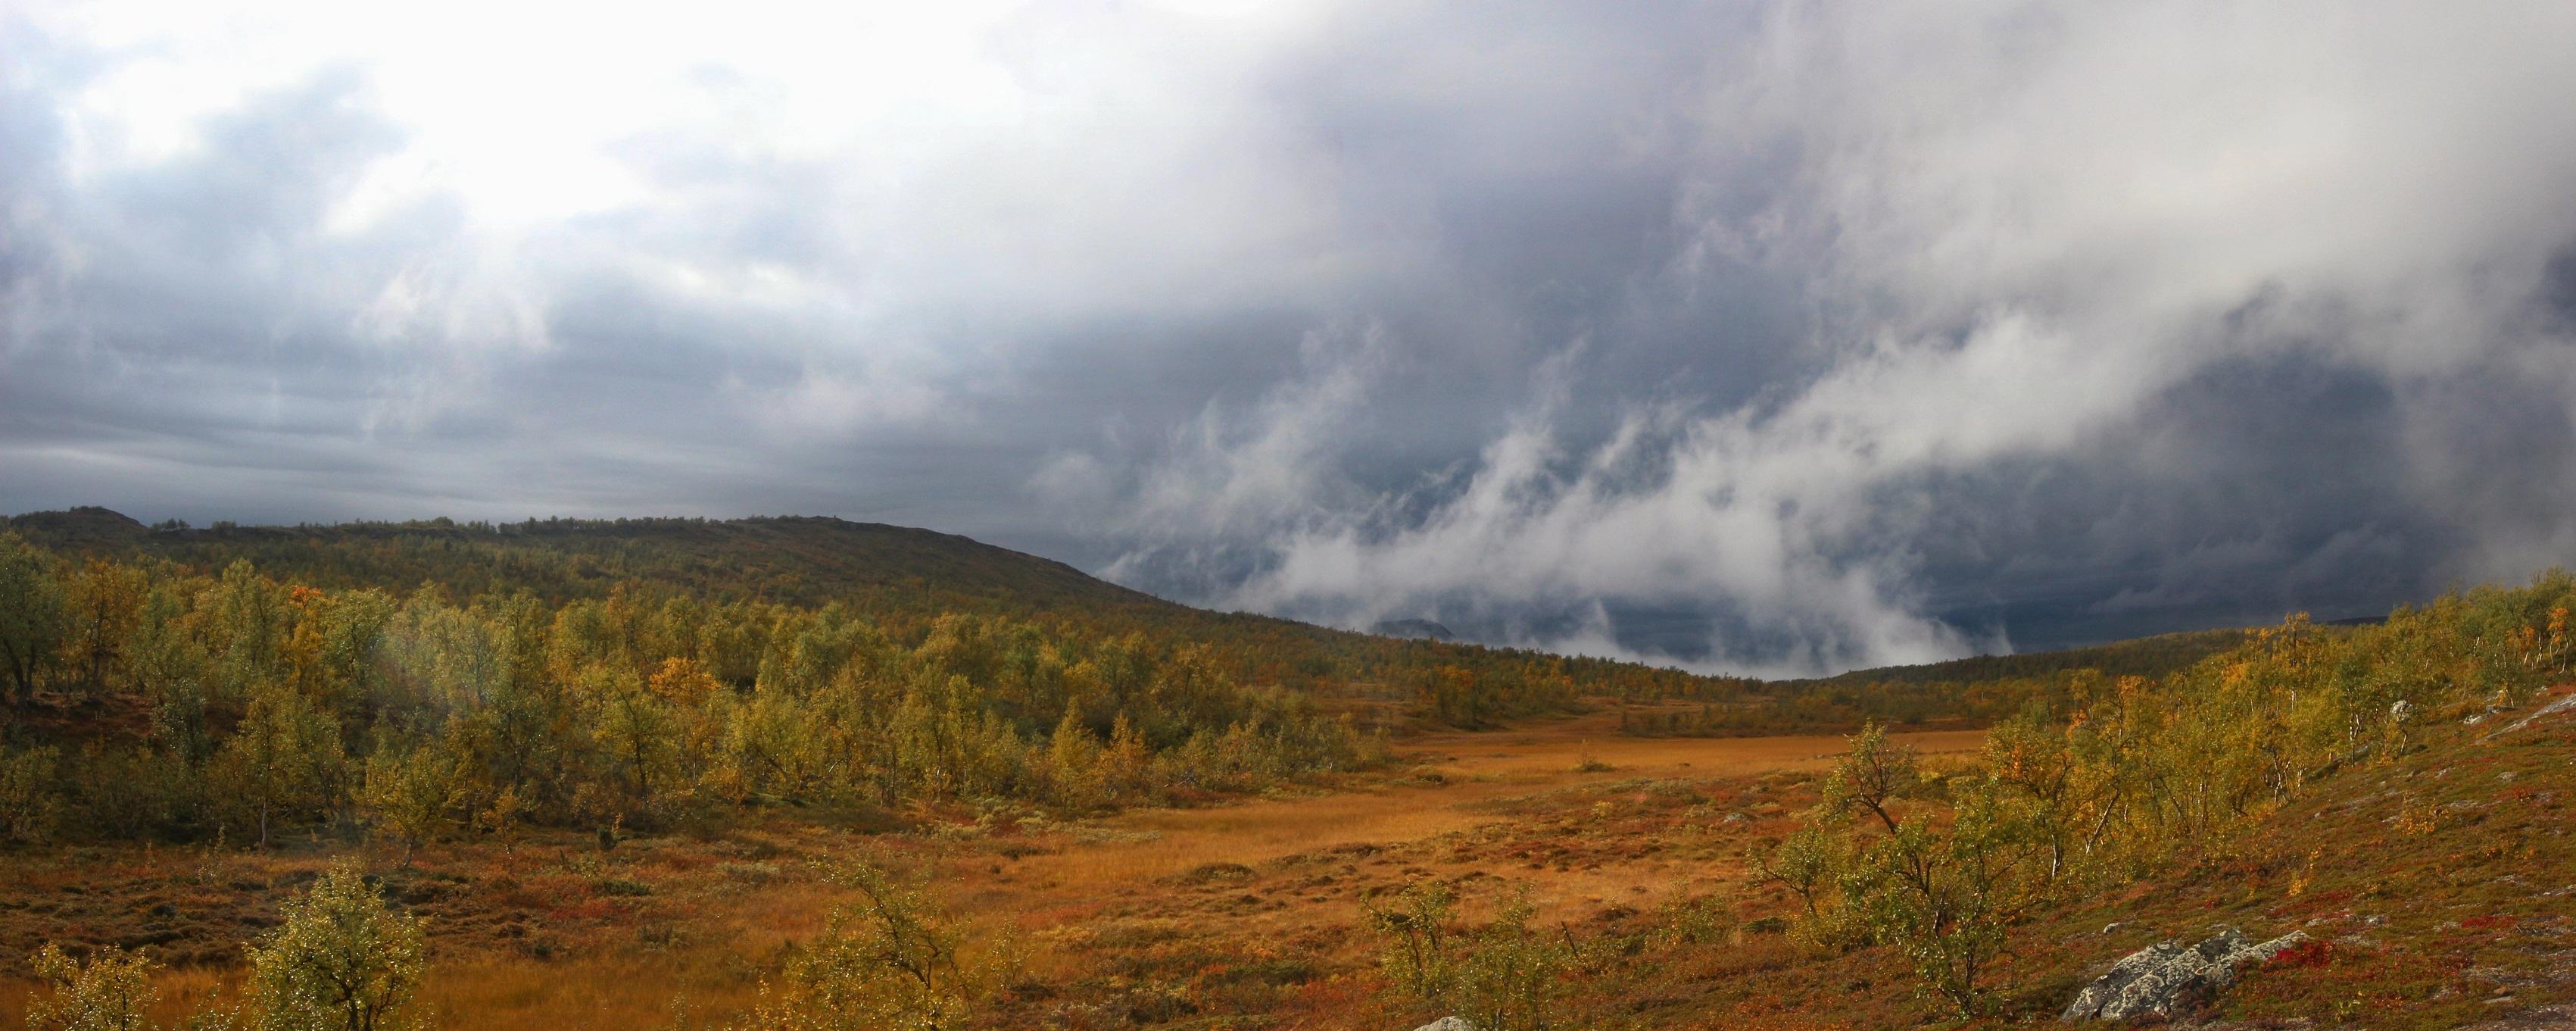 IMG_5564_panorama.jpg